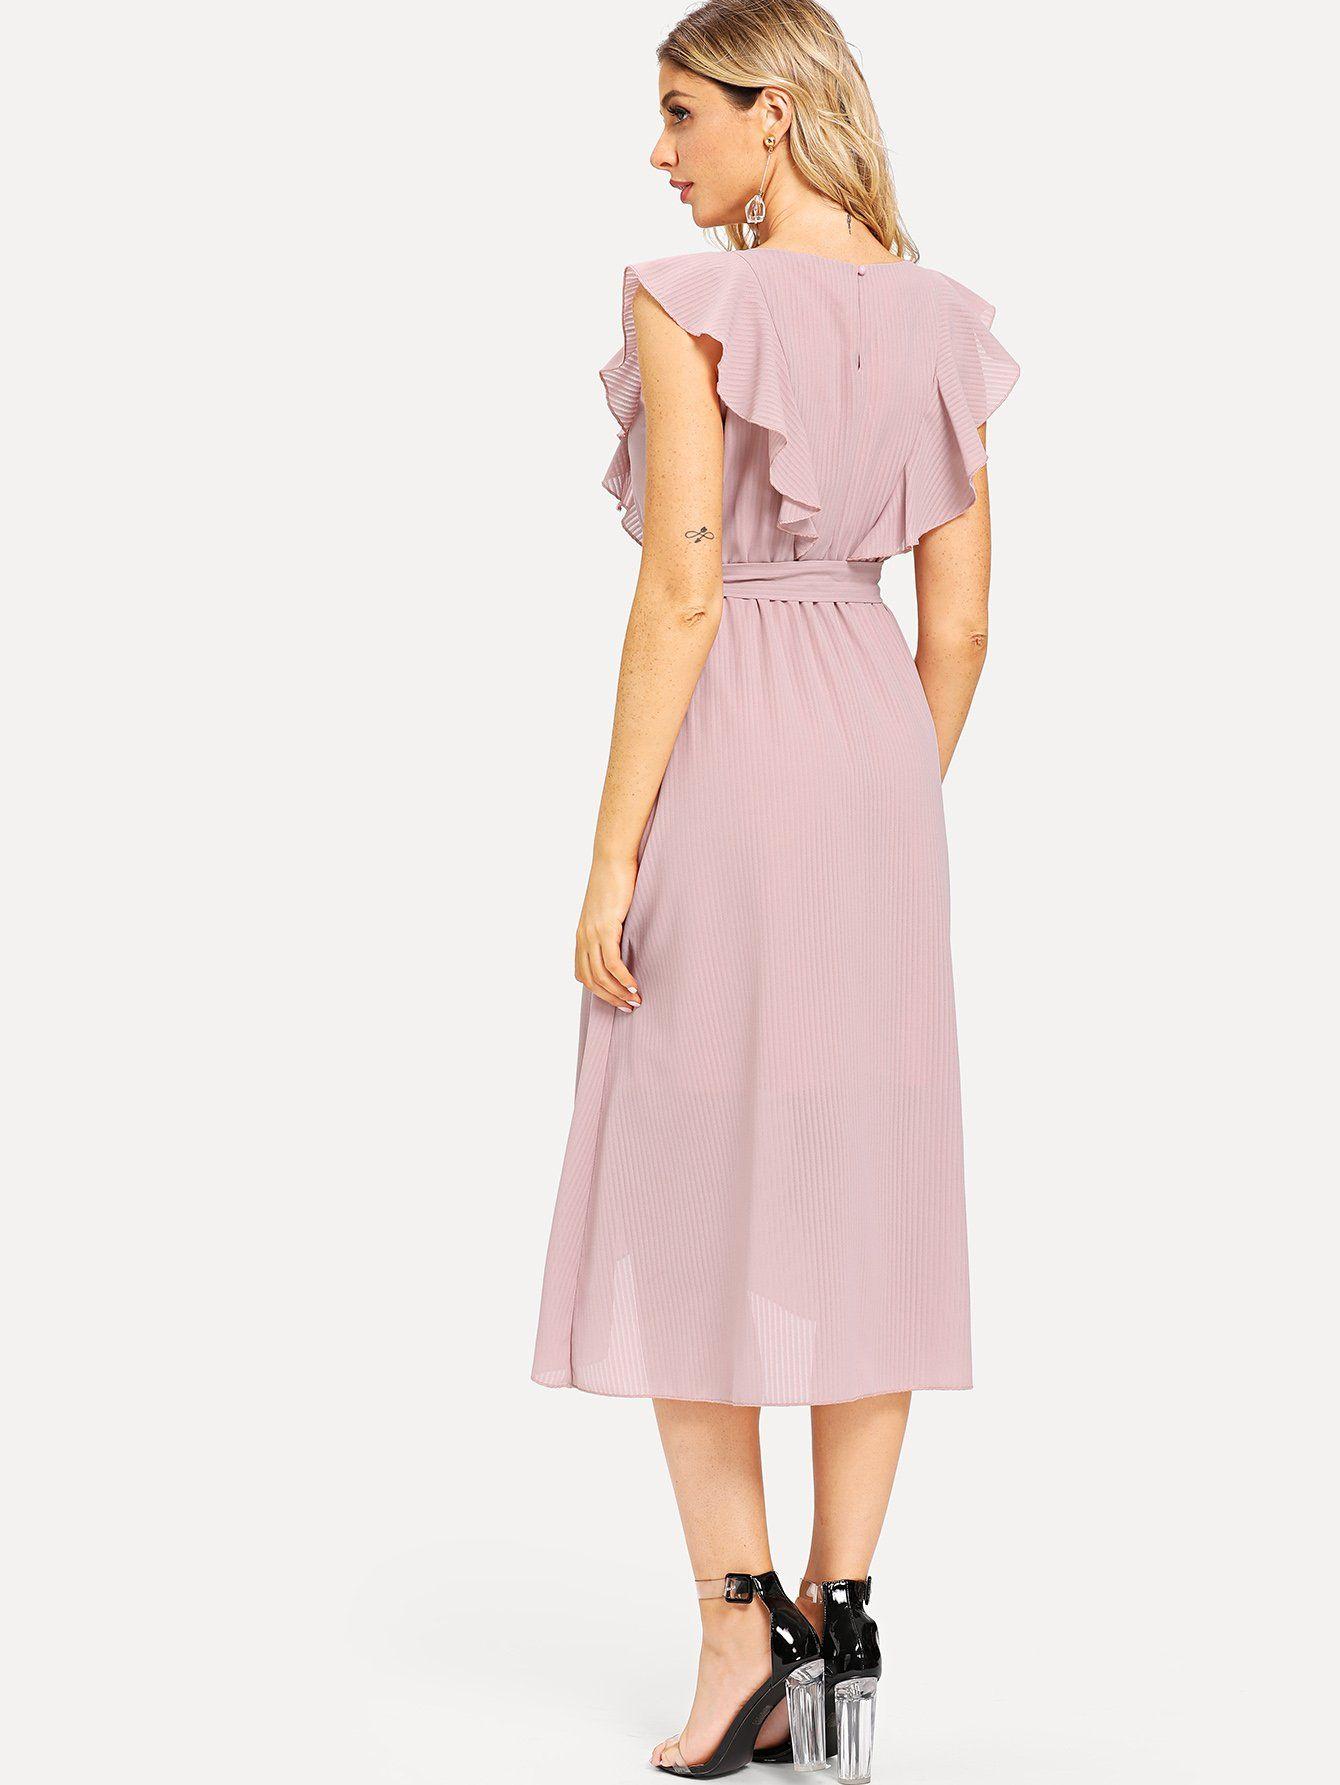 7fb82b2795 Flounce Trim Asymmetrical Wrap Hem Belted Dress -SheIn(Sheinside ...